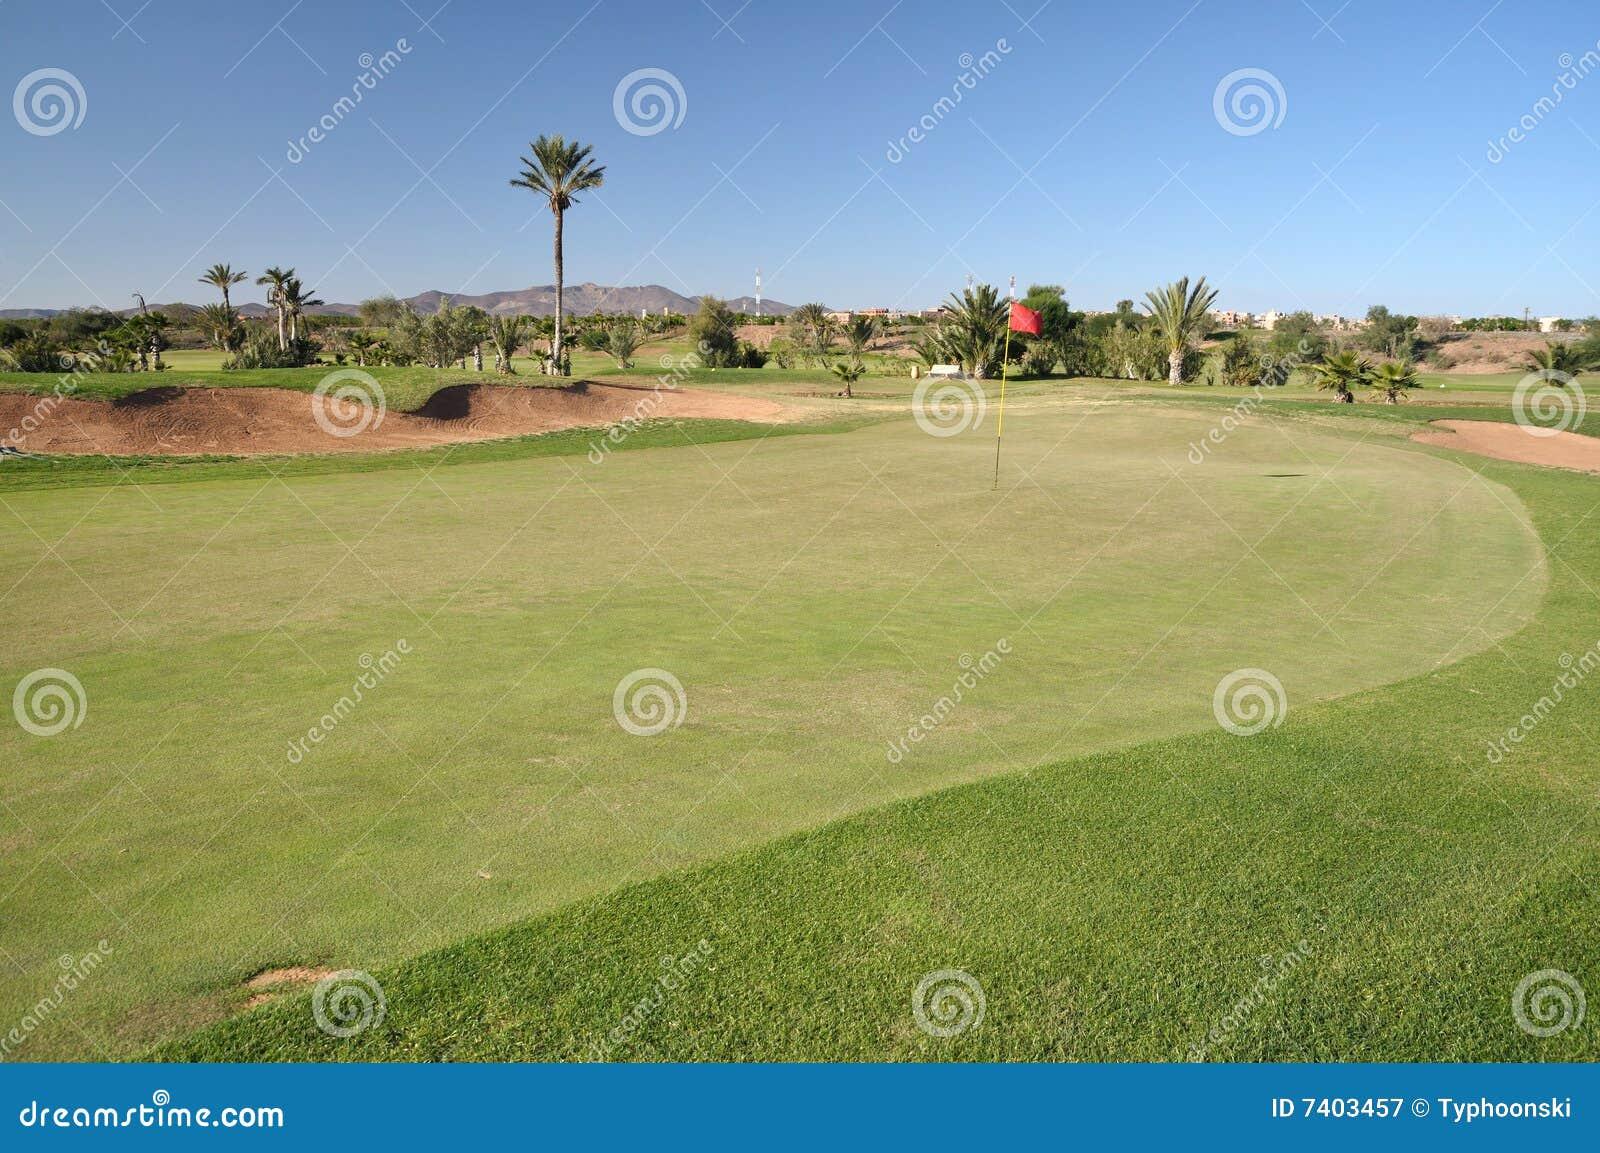 Golf course in Marrakech